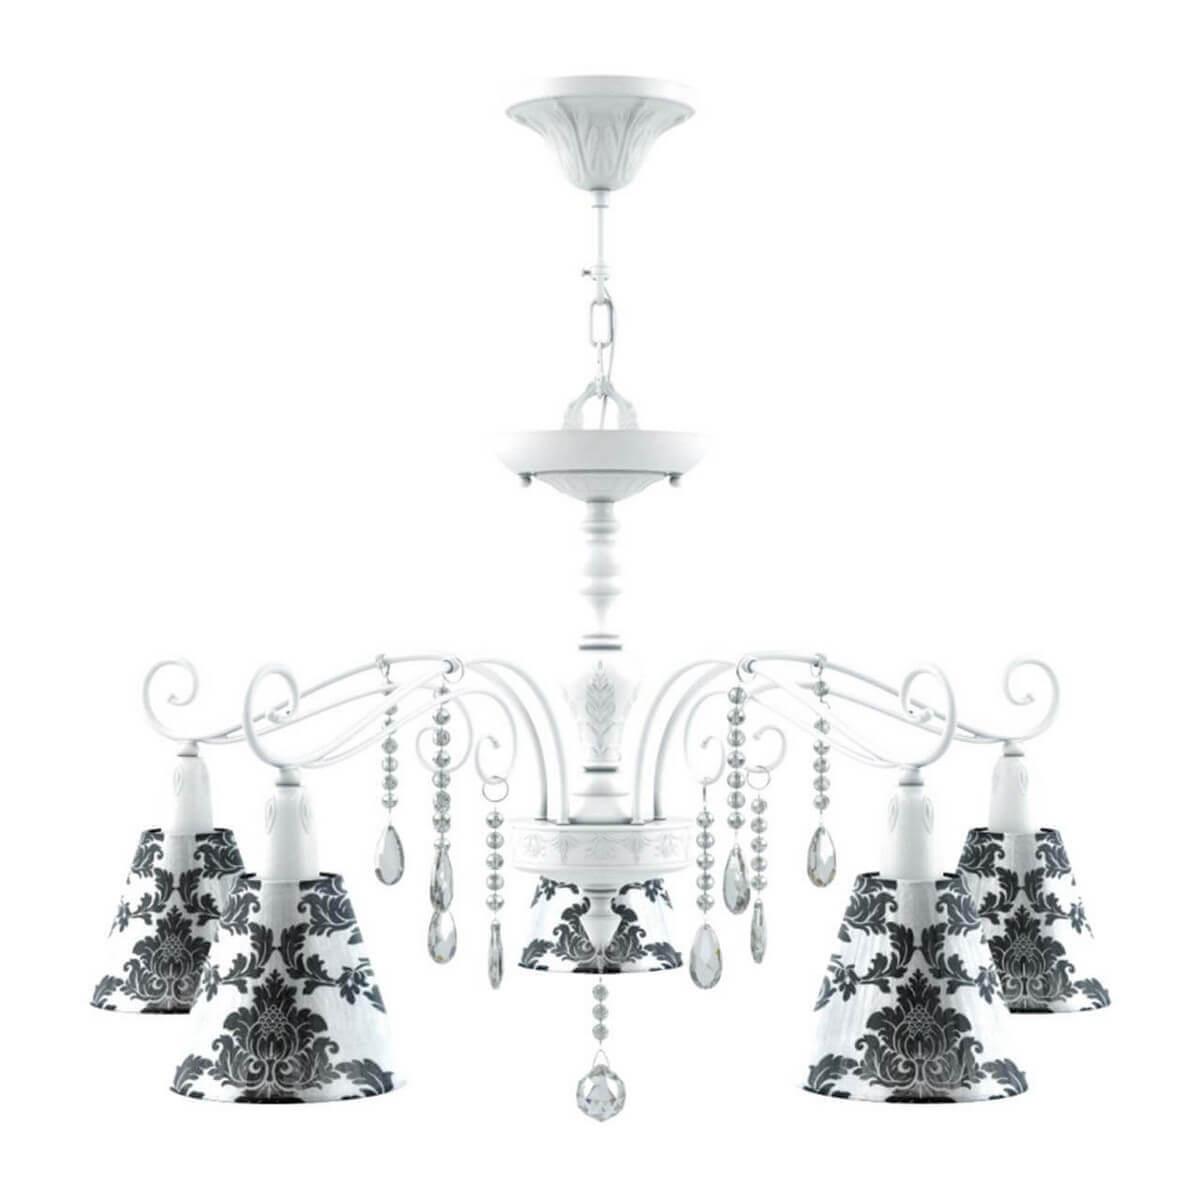 цена на Люстра Lamp4you E4-05-WM-LMP-O-2-CRL-E4-05-TR-DN Provence